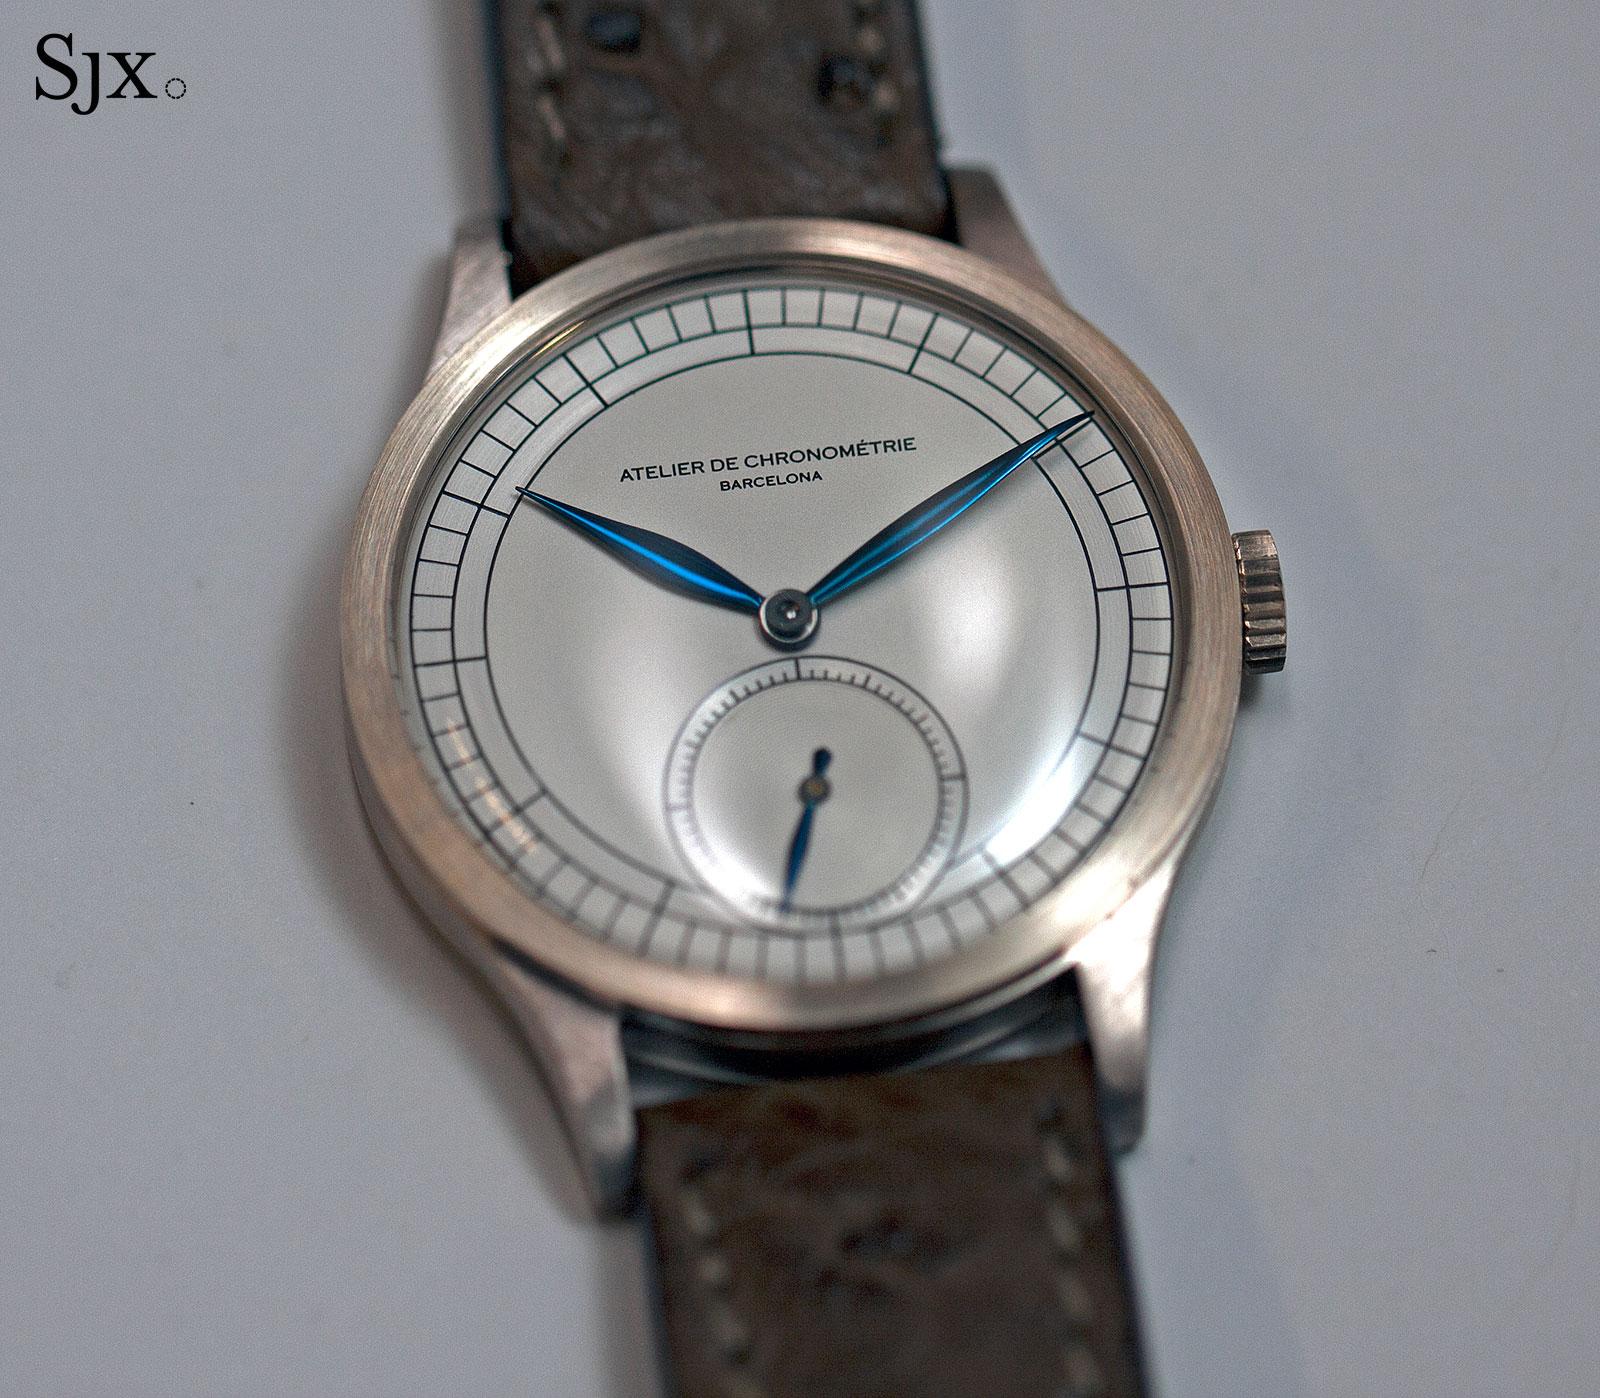 Atelier de Chronométrie Chronometer 1